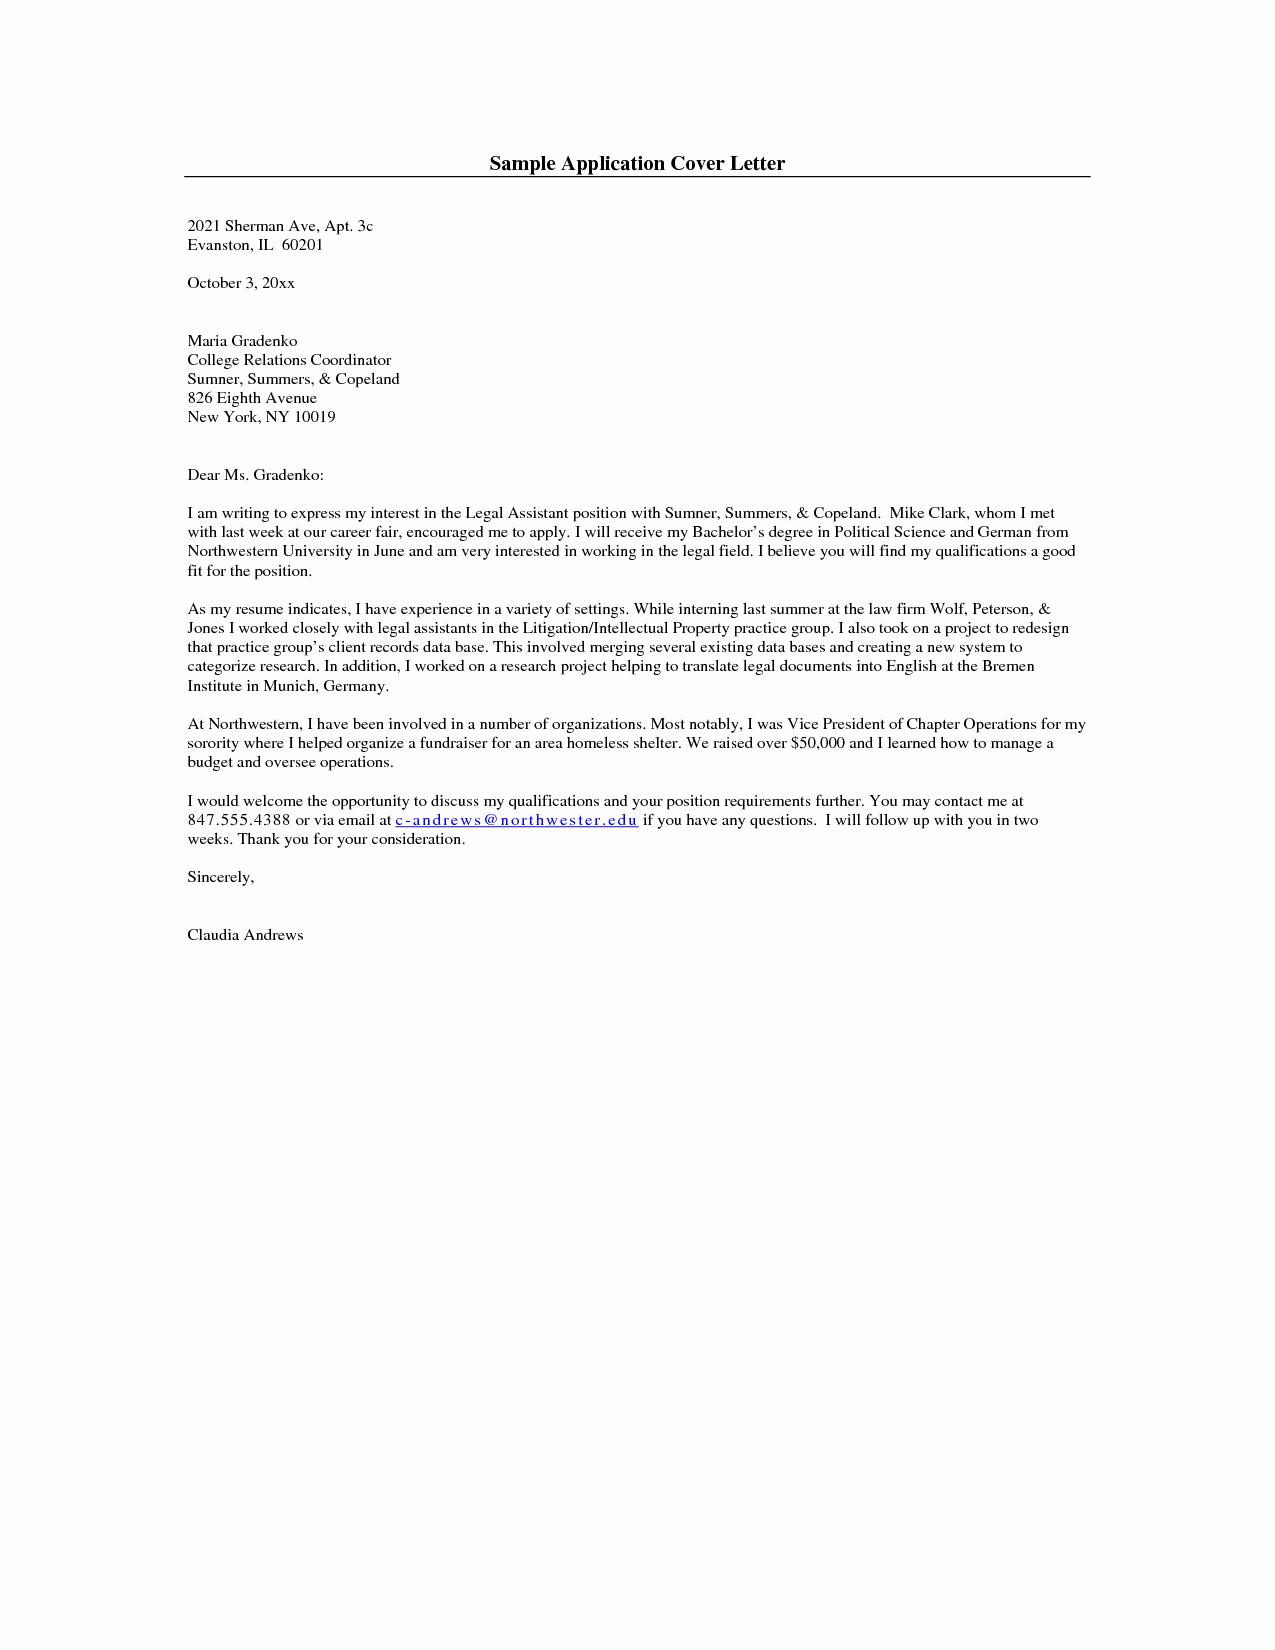 Sample A Cover Letter for Line Application